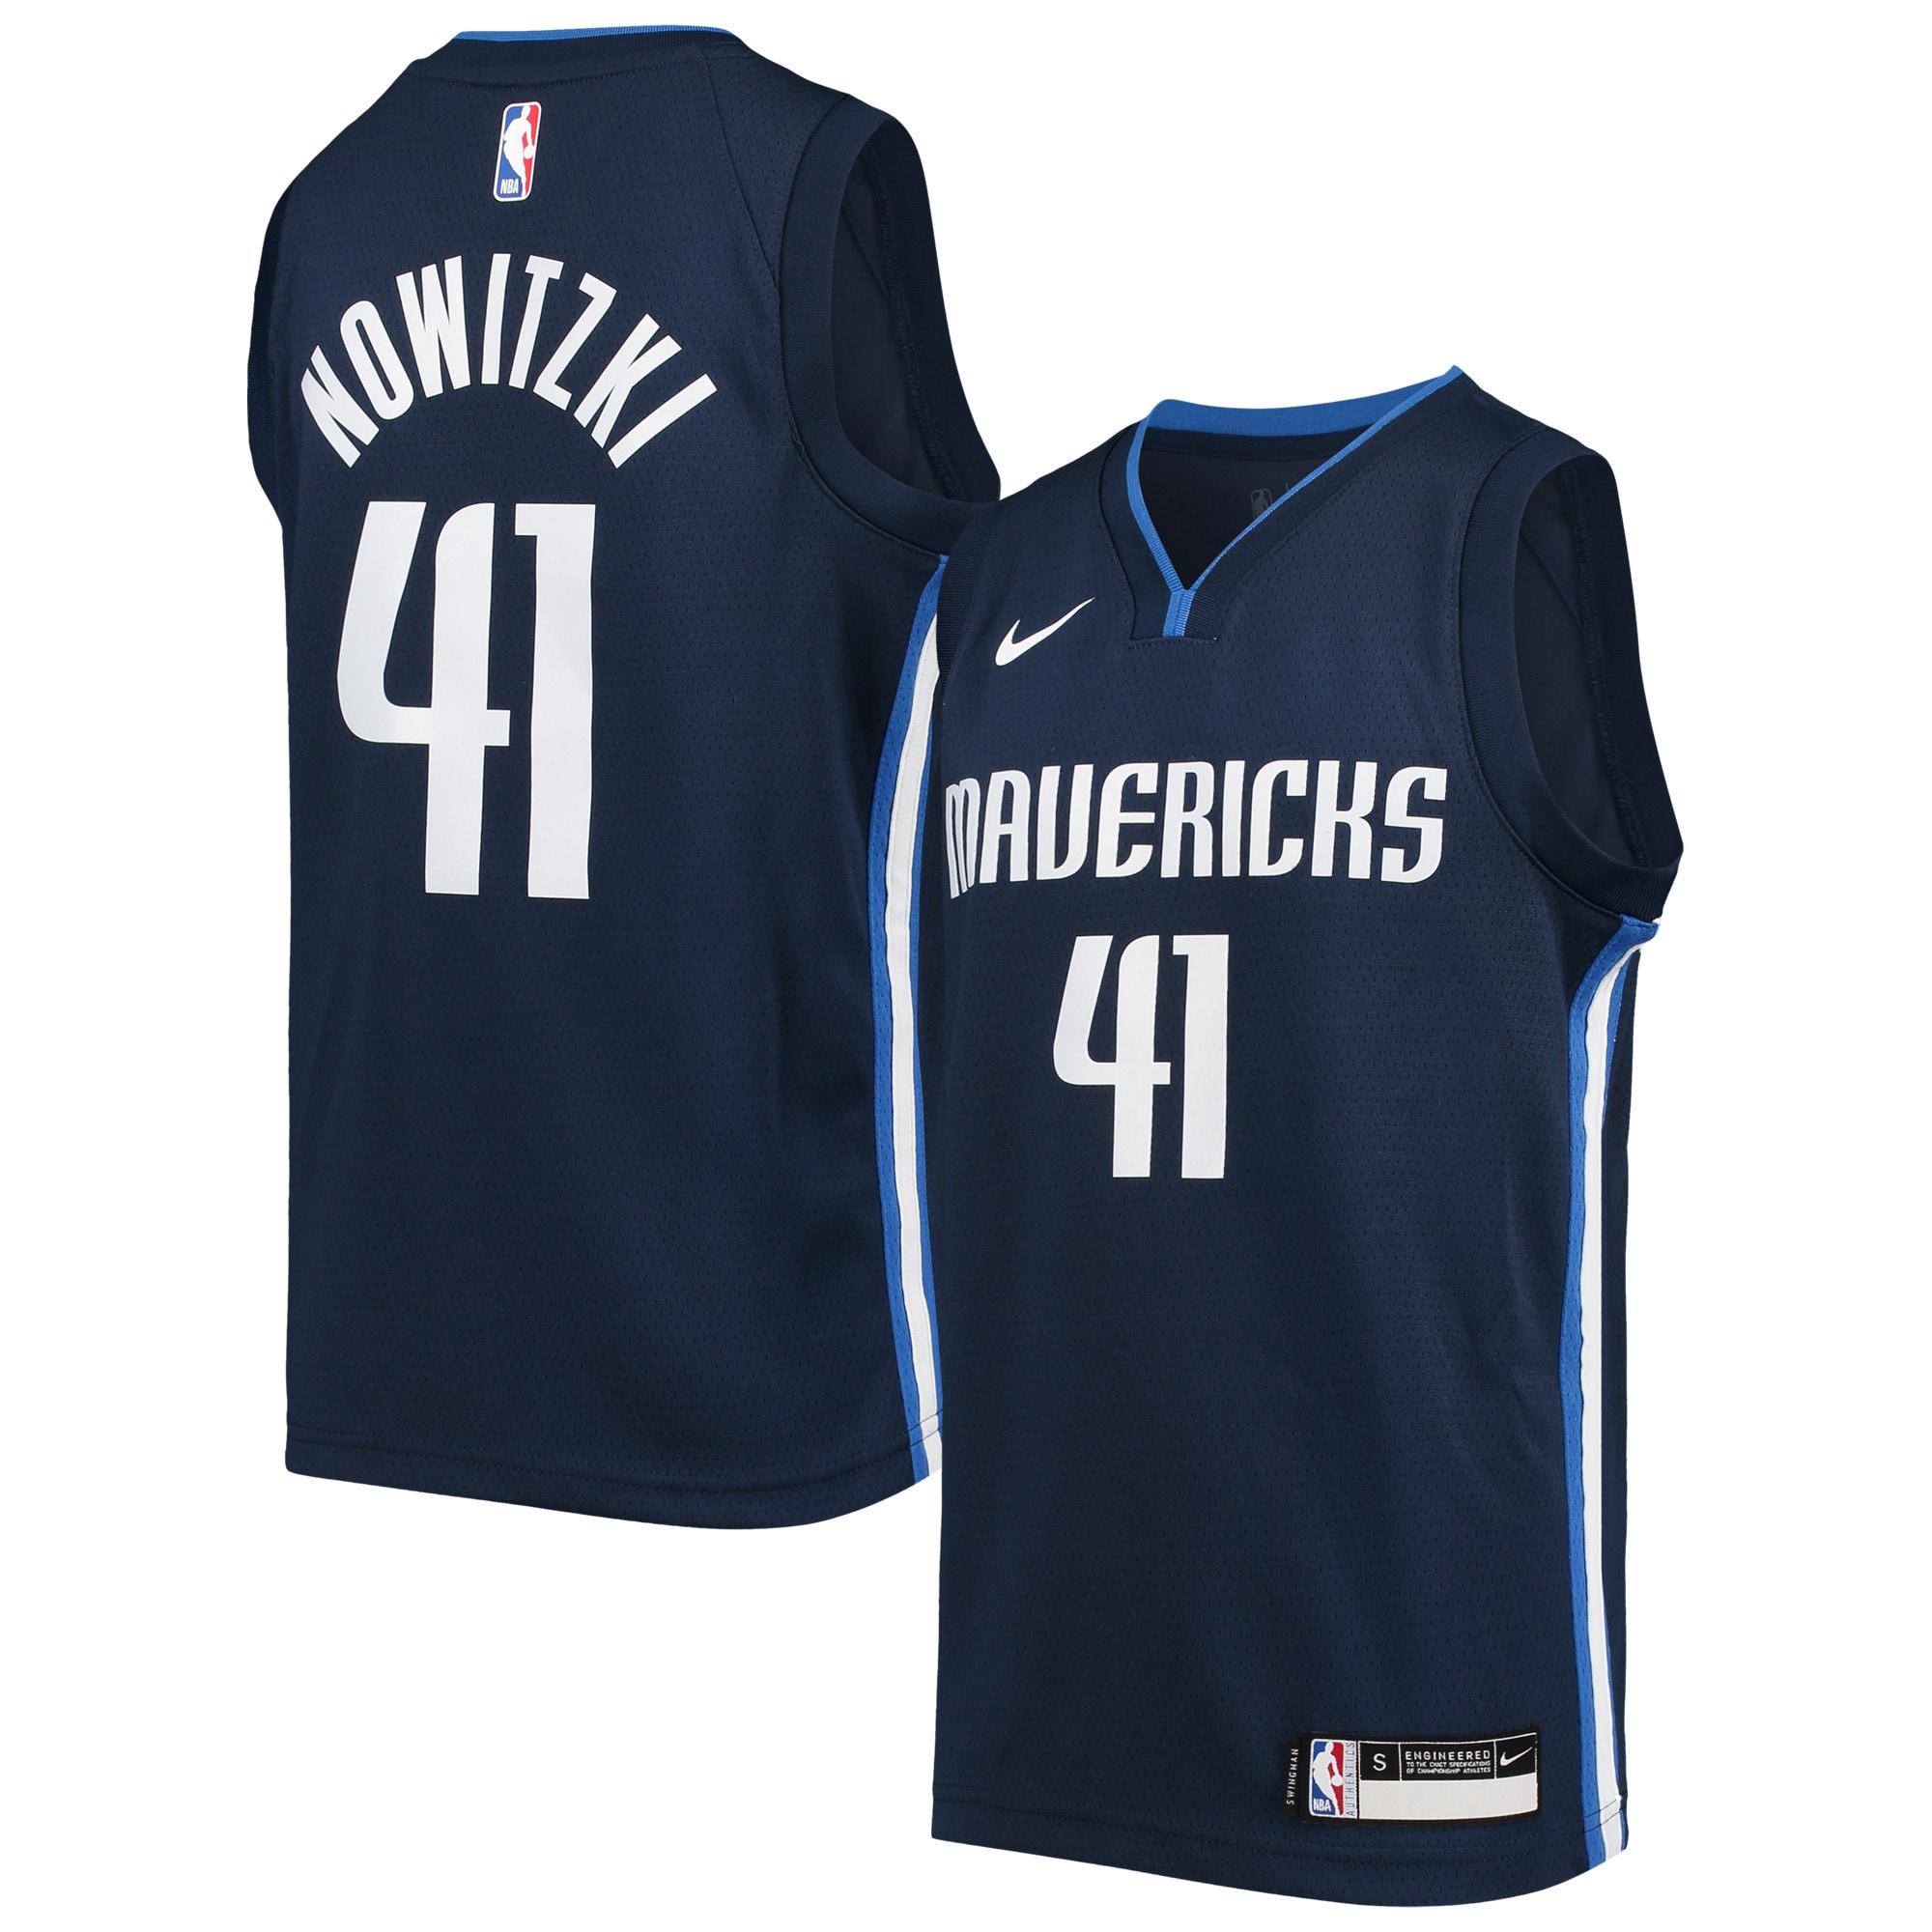 Dirk Nowitzki Dallas Mavericks Nike Youth Swingman Player Jersey - Statement Edition - Navy